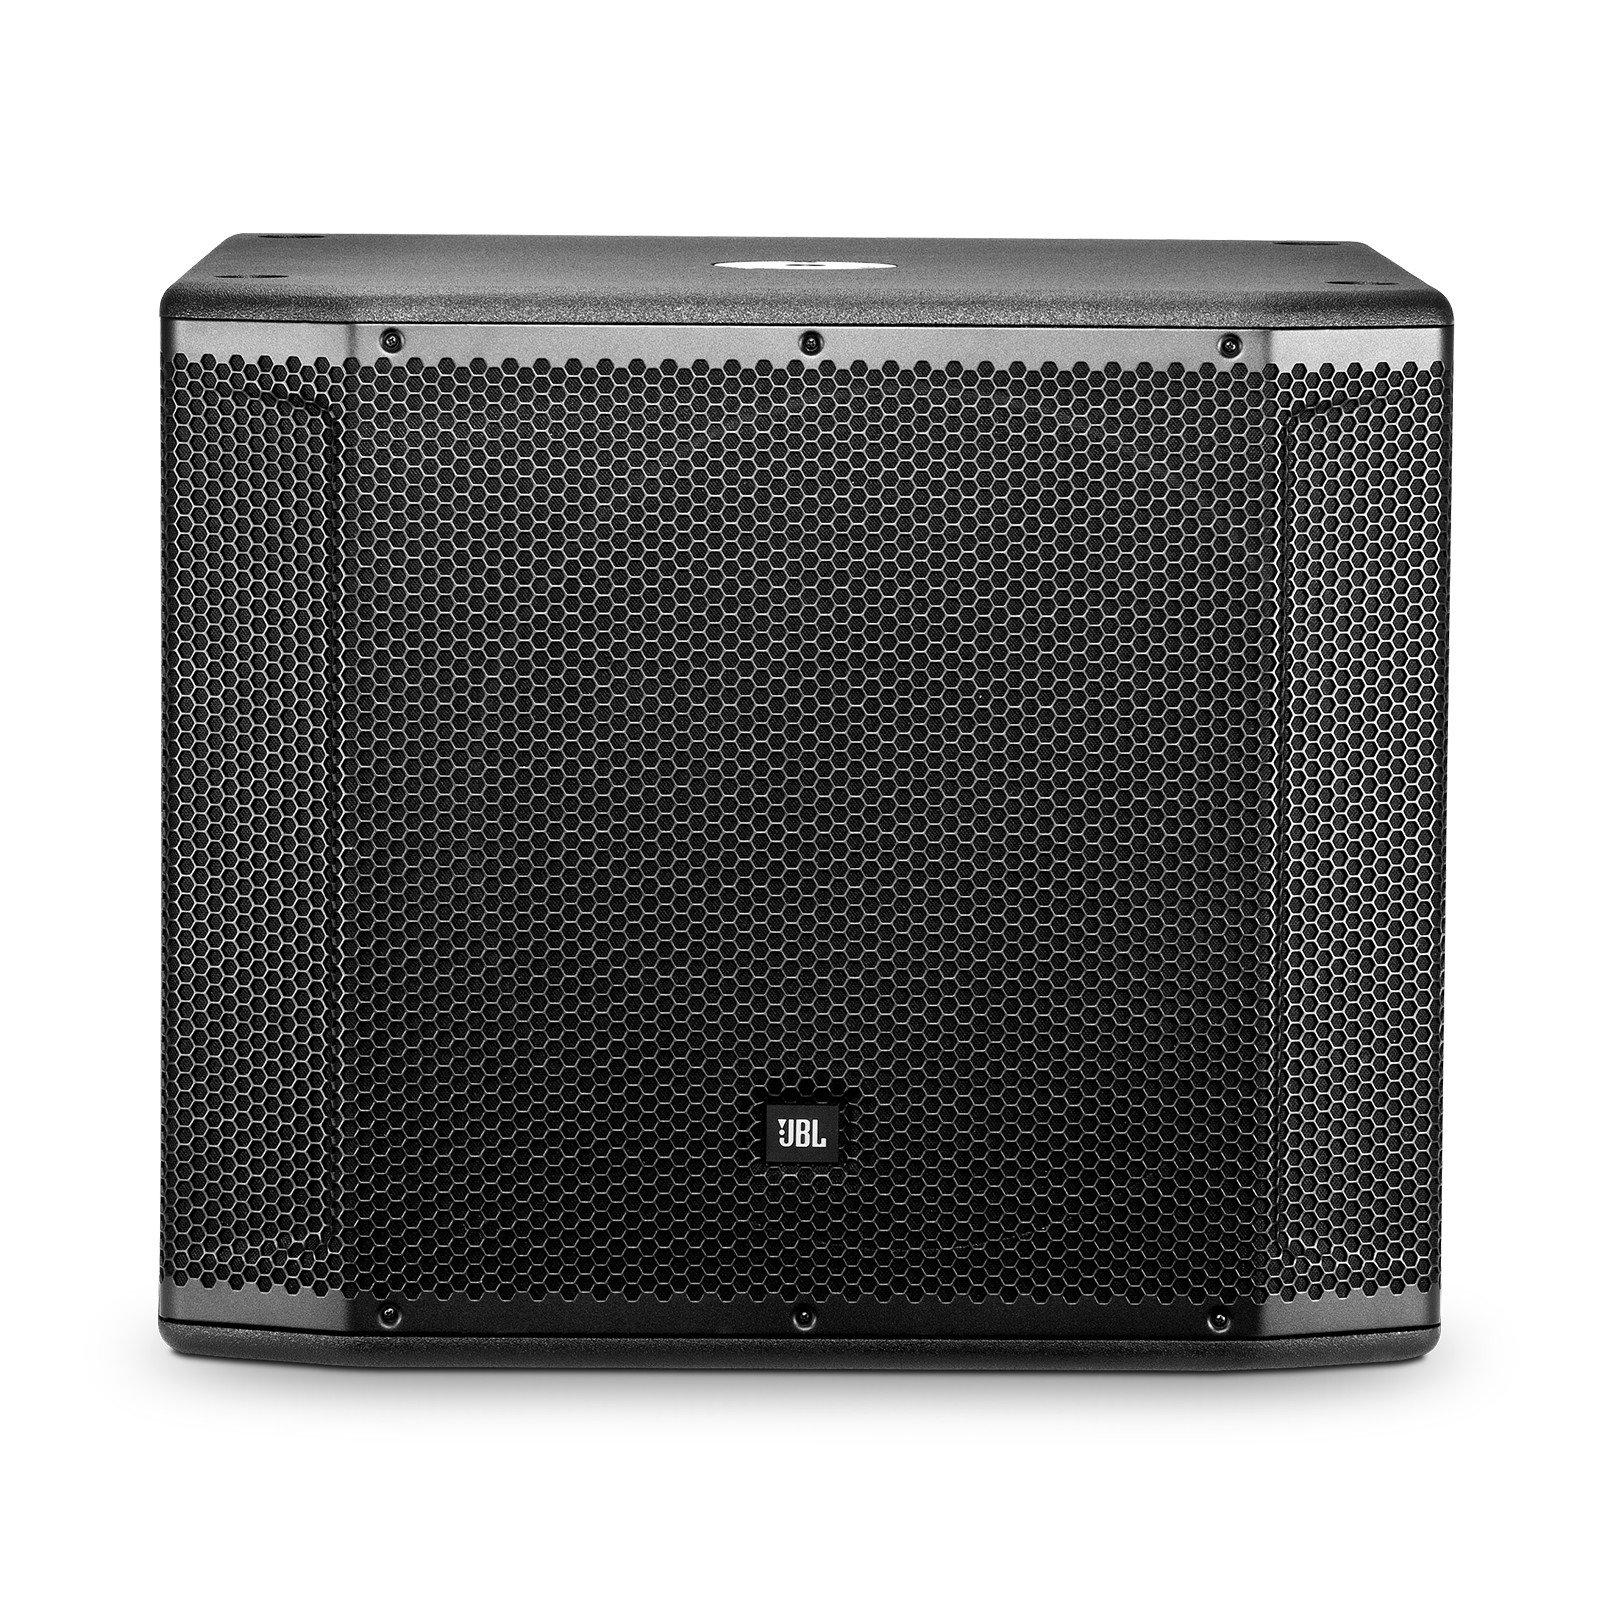 JBL Professional JBL SRX818SP Channel Powered Speaker Cabinet, Single (SRX818SP) by JBL Professional